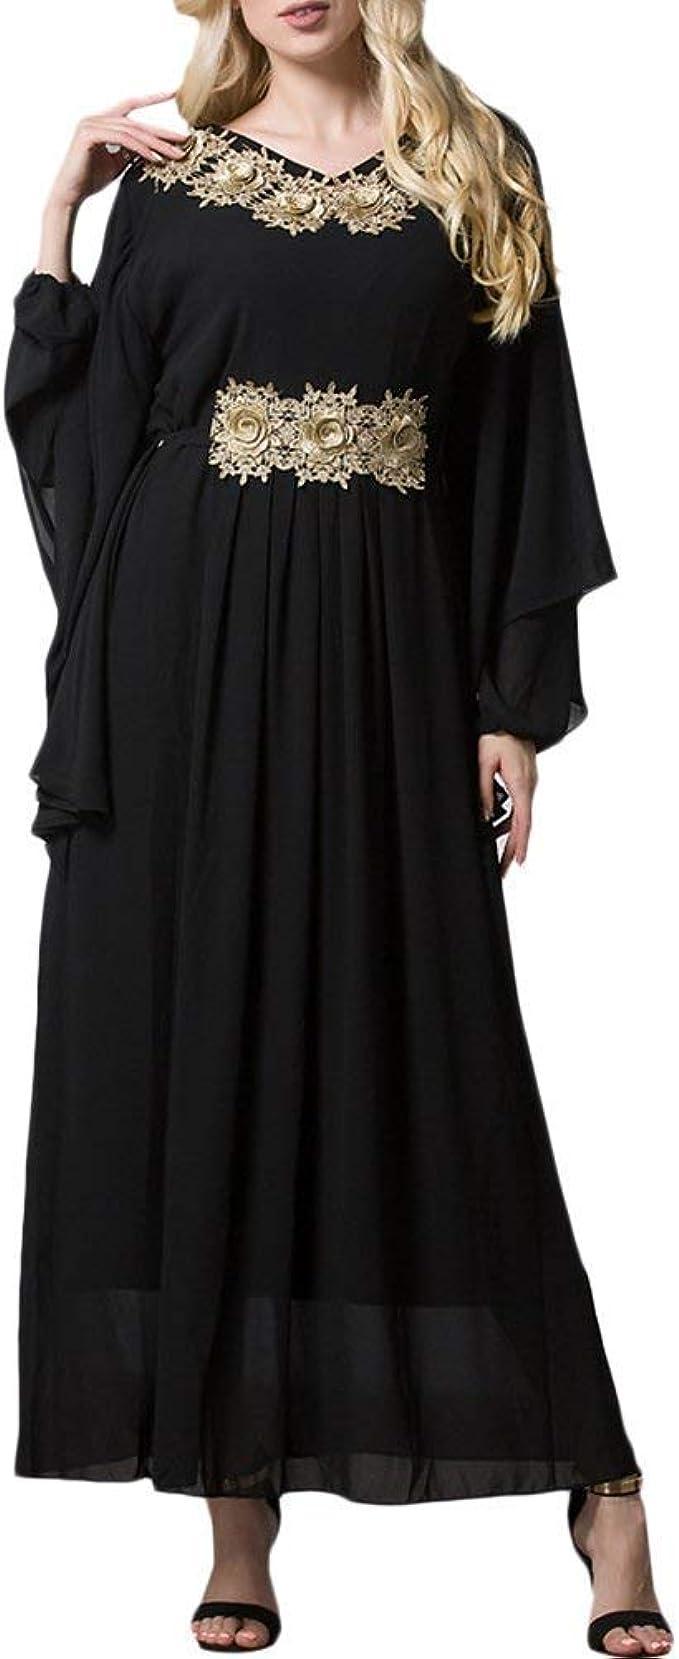 Somoll Muslime Abaya Kleid Kaftan/Kaftan türkische Roben Kleider